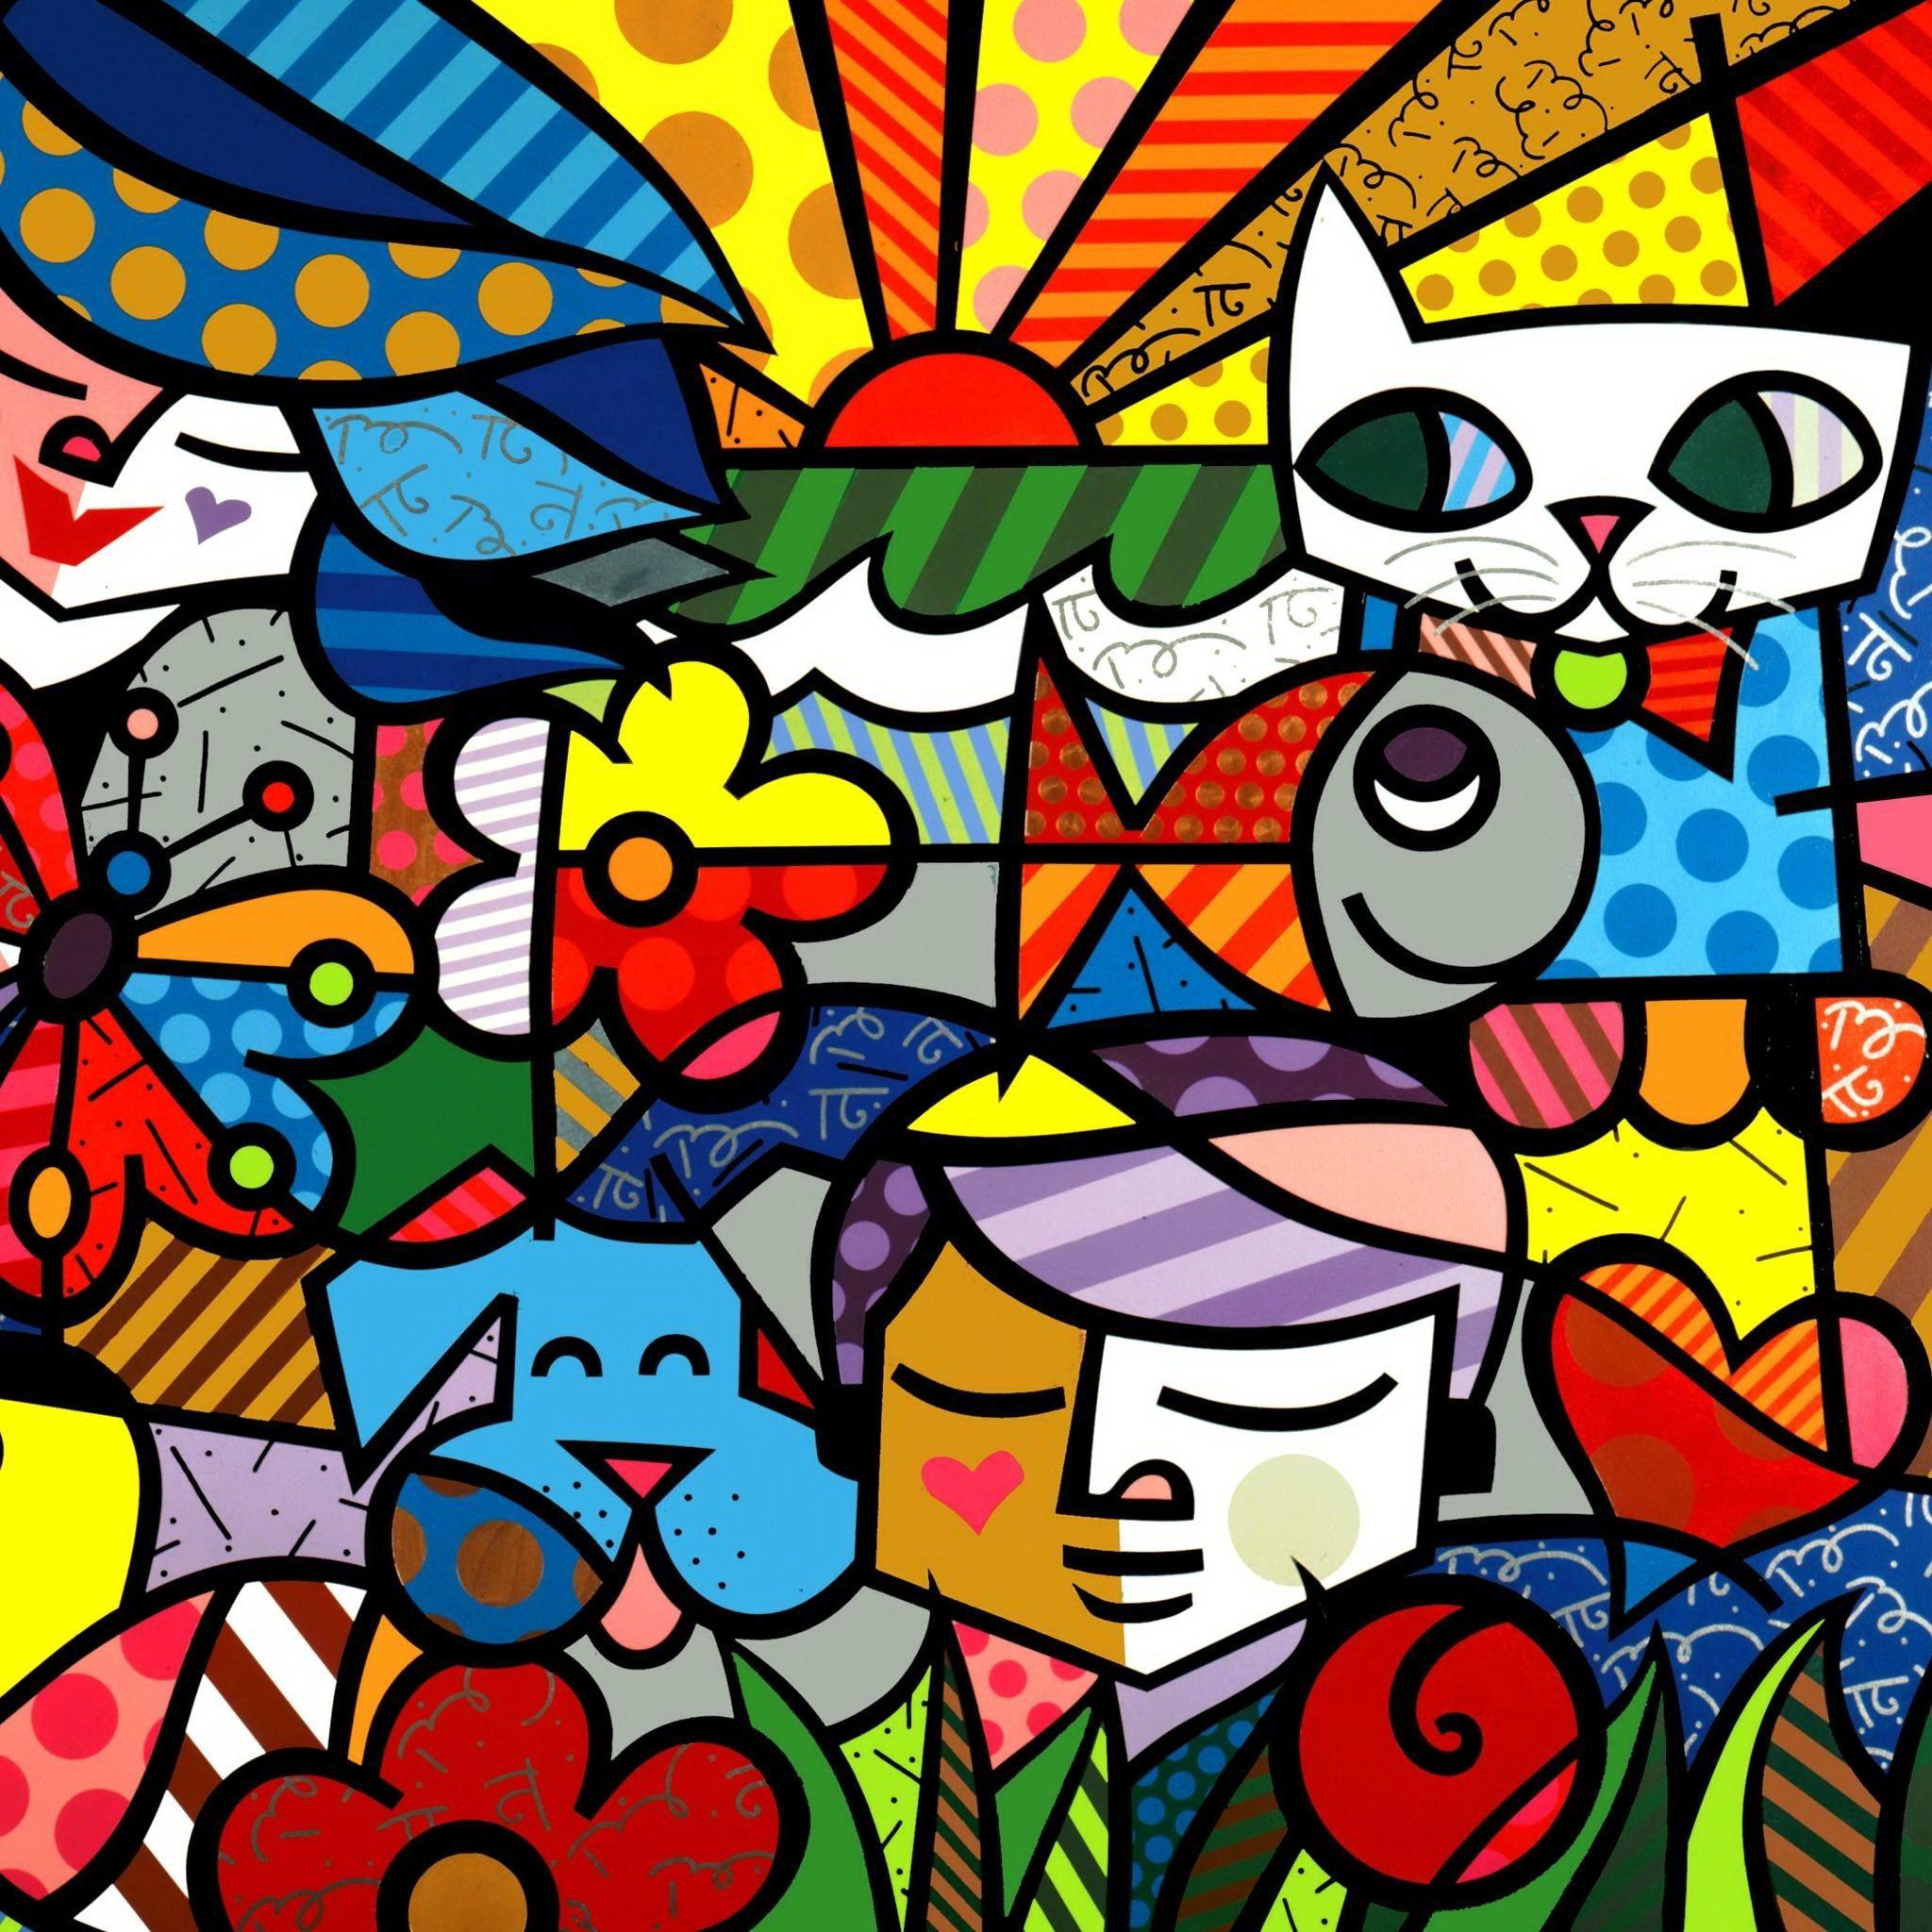 Pop Art Wallpapers (60+ Images